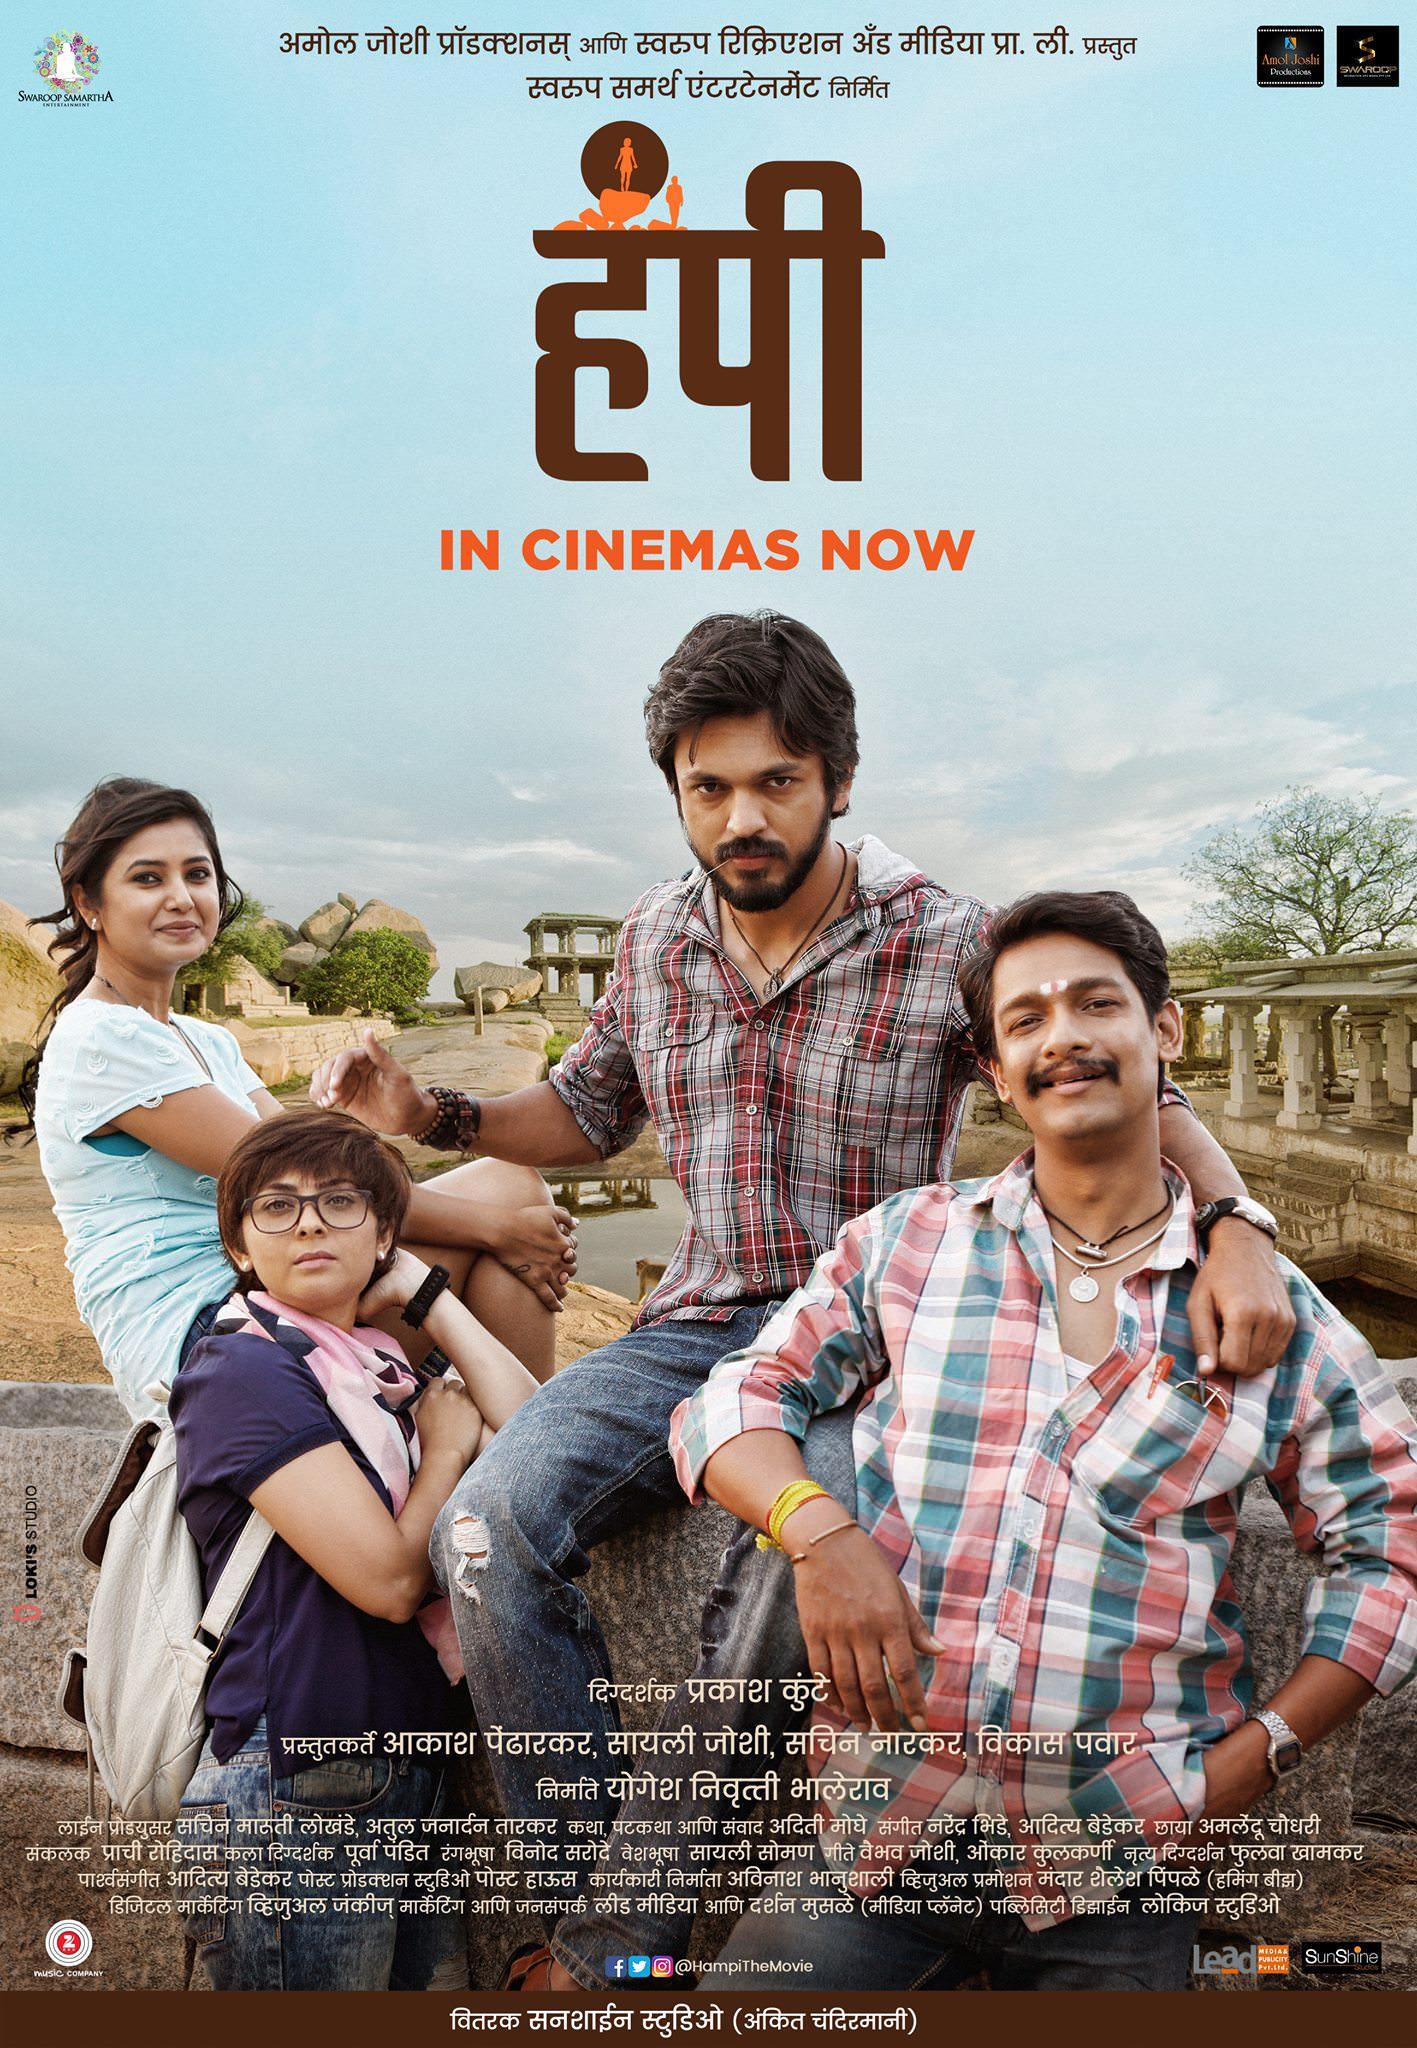 Hampi 2017 Marathi Movie Cast Trailer Wiki poster Release ...